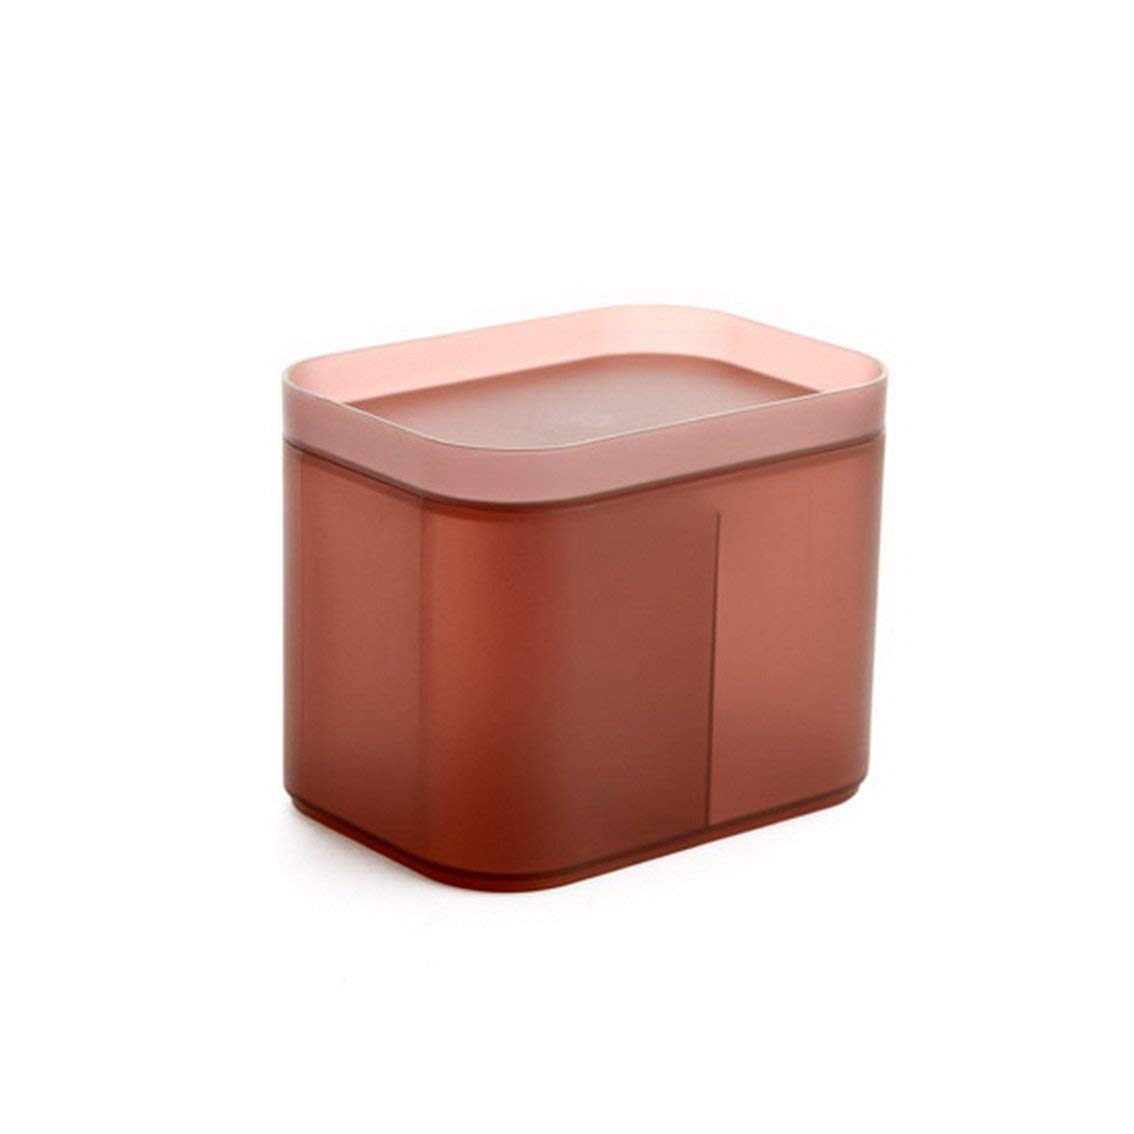 fengg2030shann Desktop storage plastic boxes desk desk finishing transparent box dresser storage boxes. Desk finishing box storage box dresser desk desk sorting boxes desk finishing box storage box